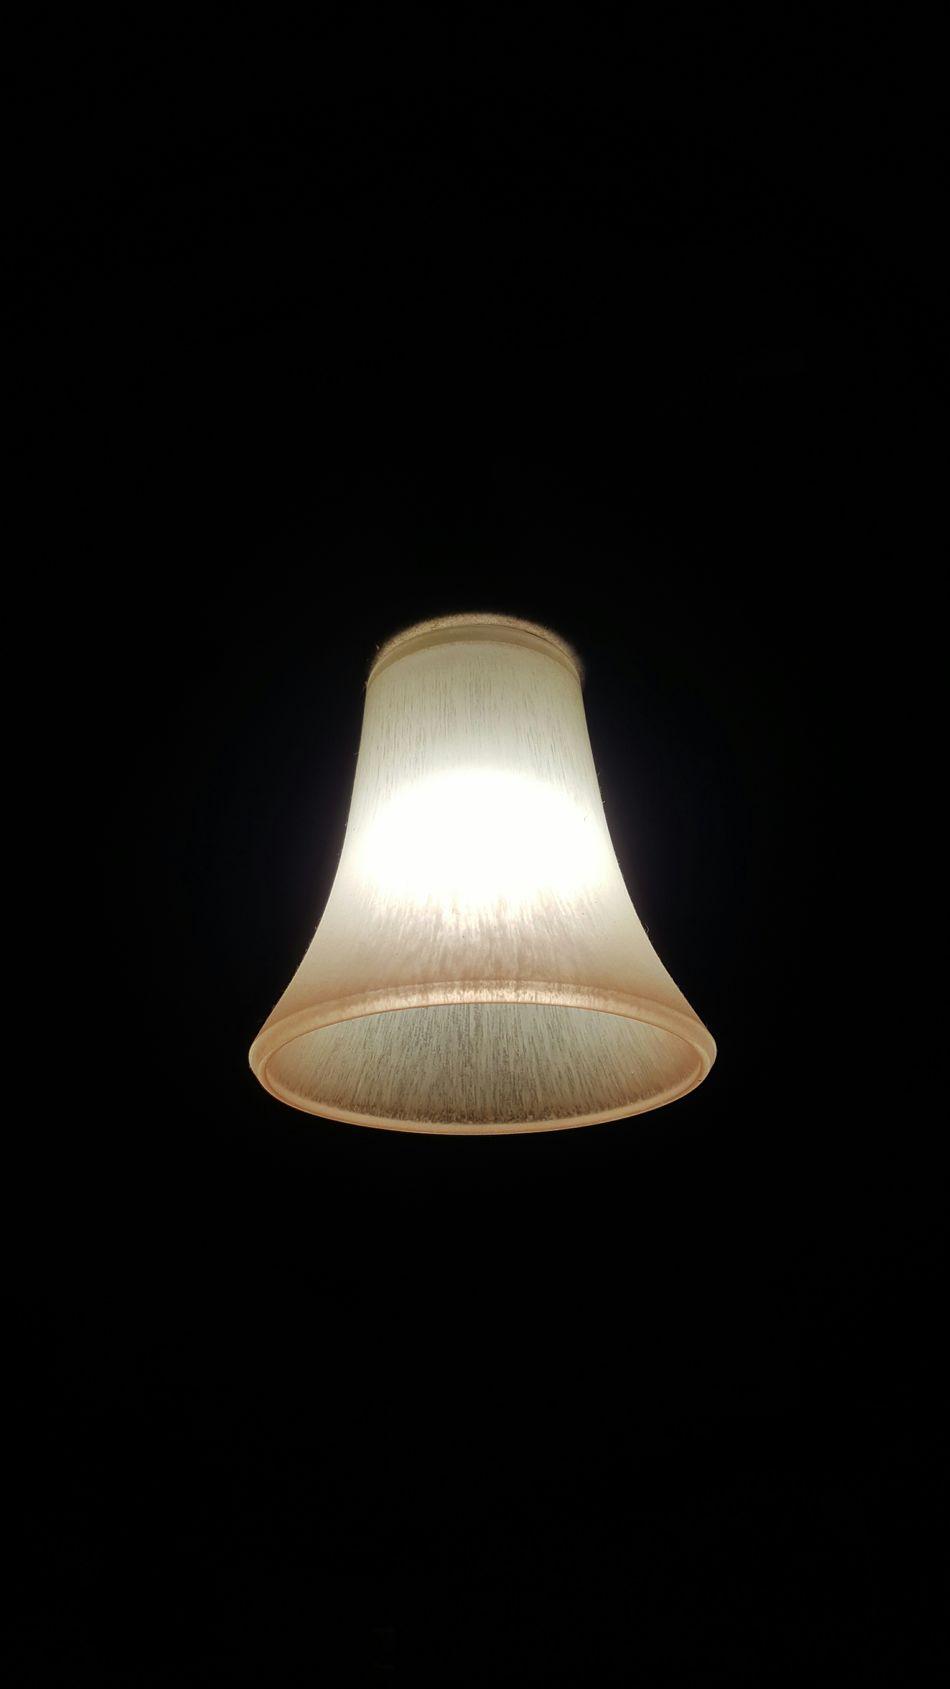 Vintage Light Lighting Light Fixture Hanginglamp Hanginglights